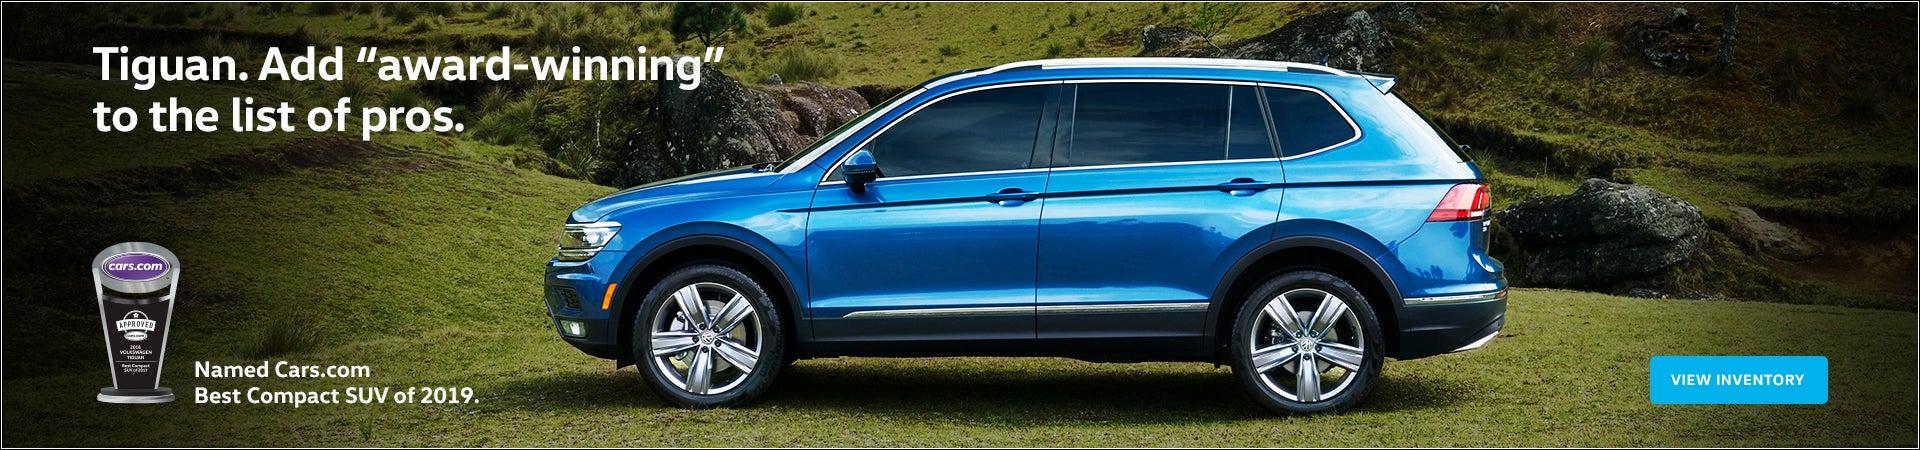 Saint Paul MN Volkswagen dealer serving Saint Paul - New and